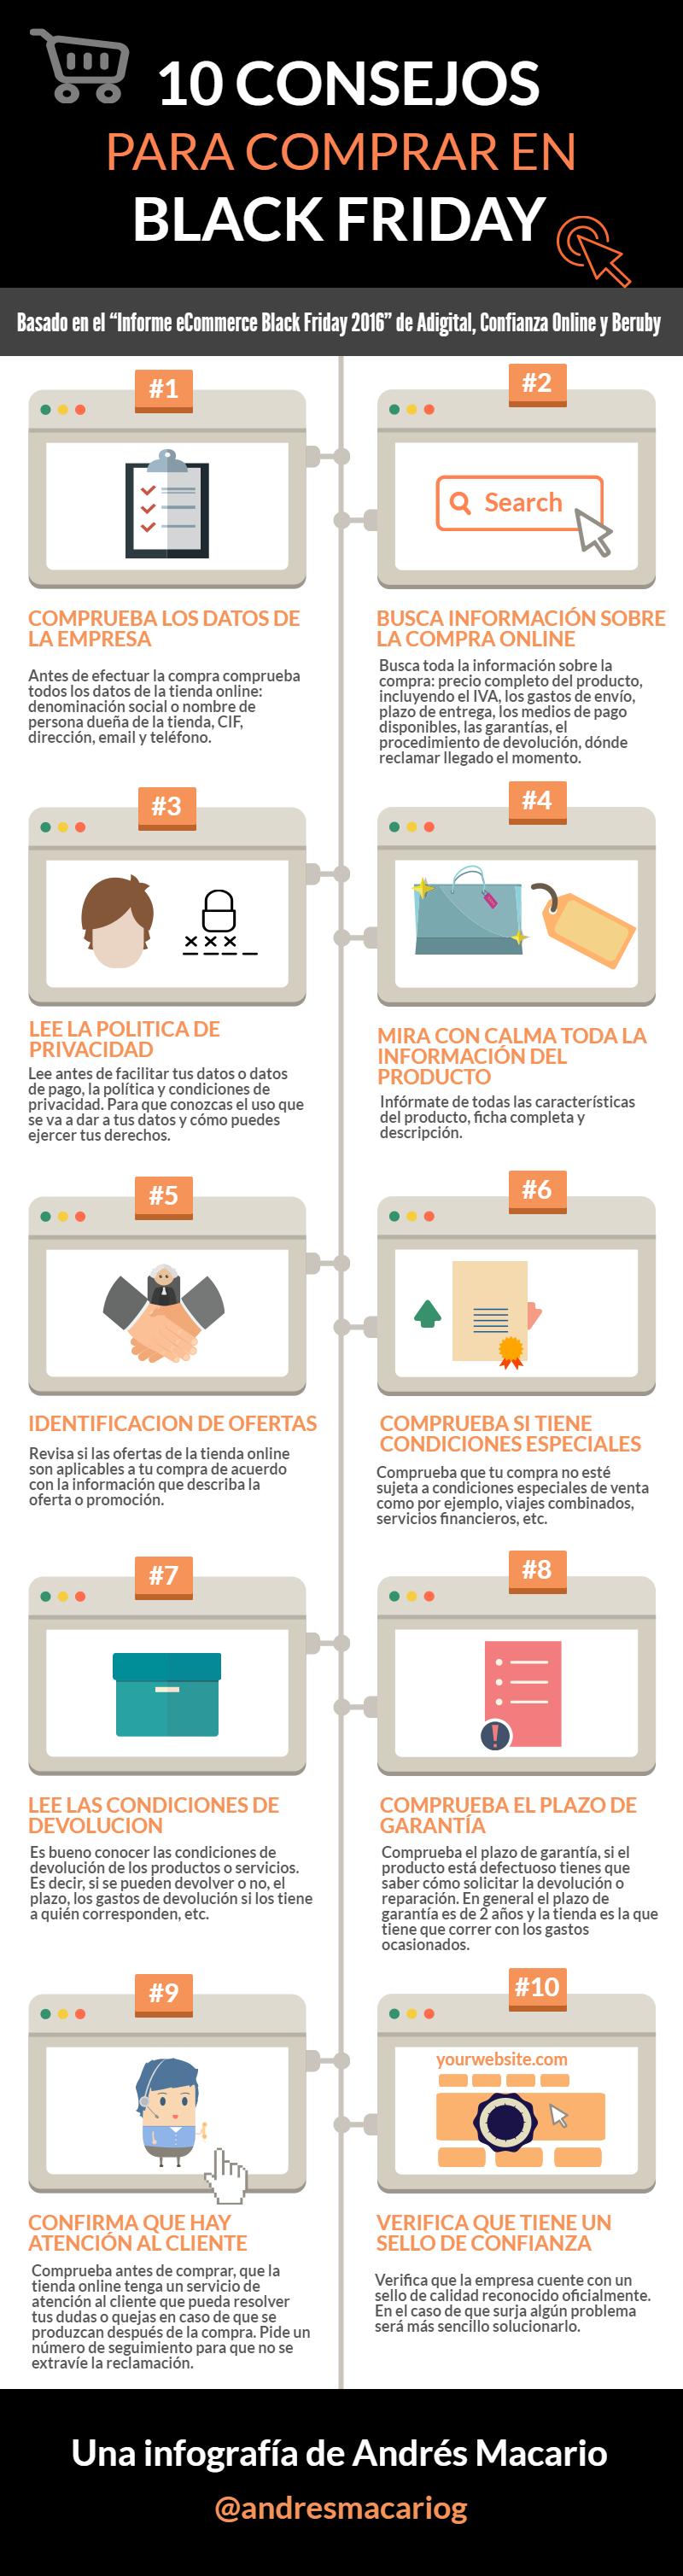 10 consejos para comprar en Black Friday- Infografia Andres Macario